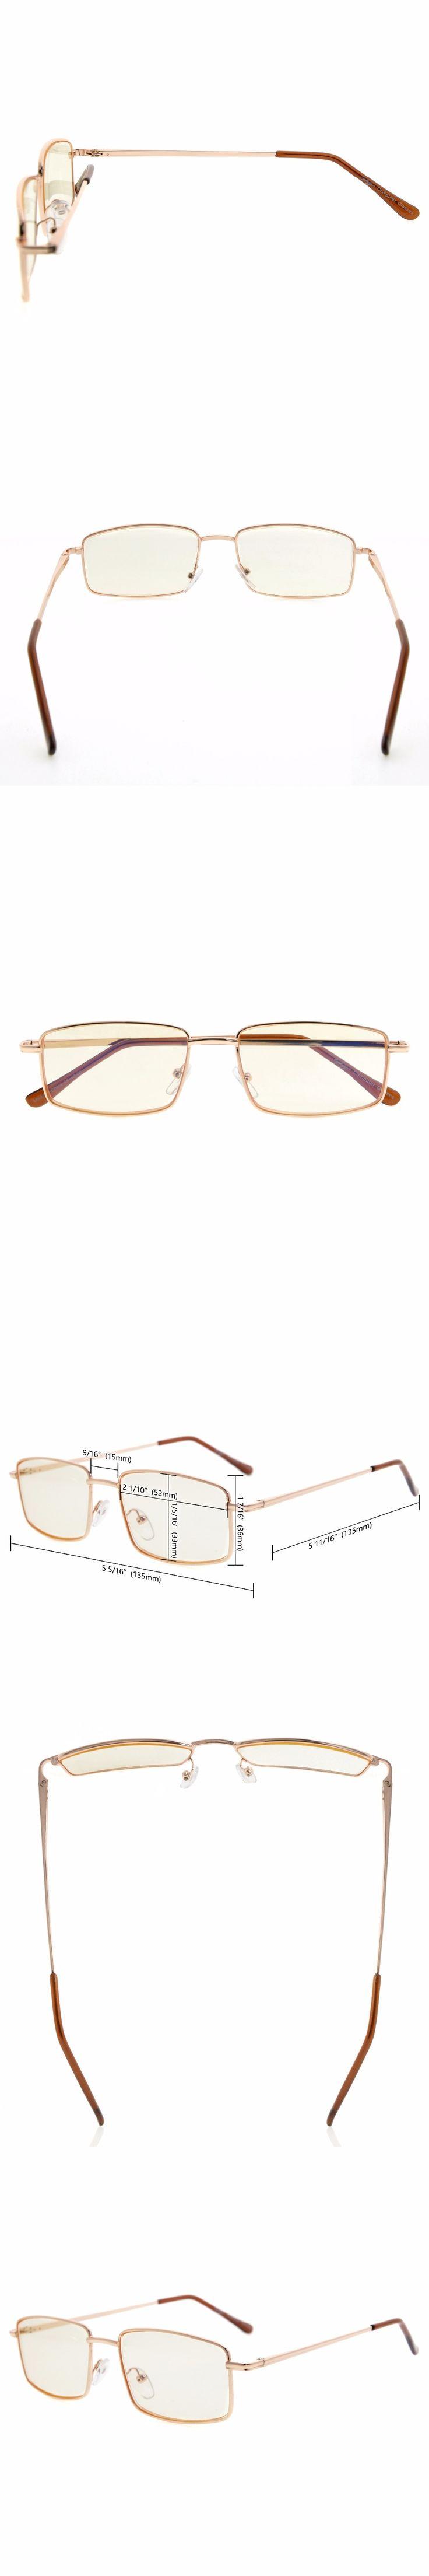 CG15023 Amber Tinted Lens Eyekepper Spring Hinges Anti-Blue Ray / Anti-Strain Computer Reading Glasses Computer Eyeglasses